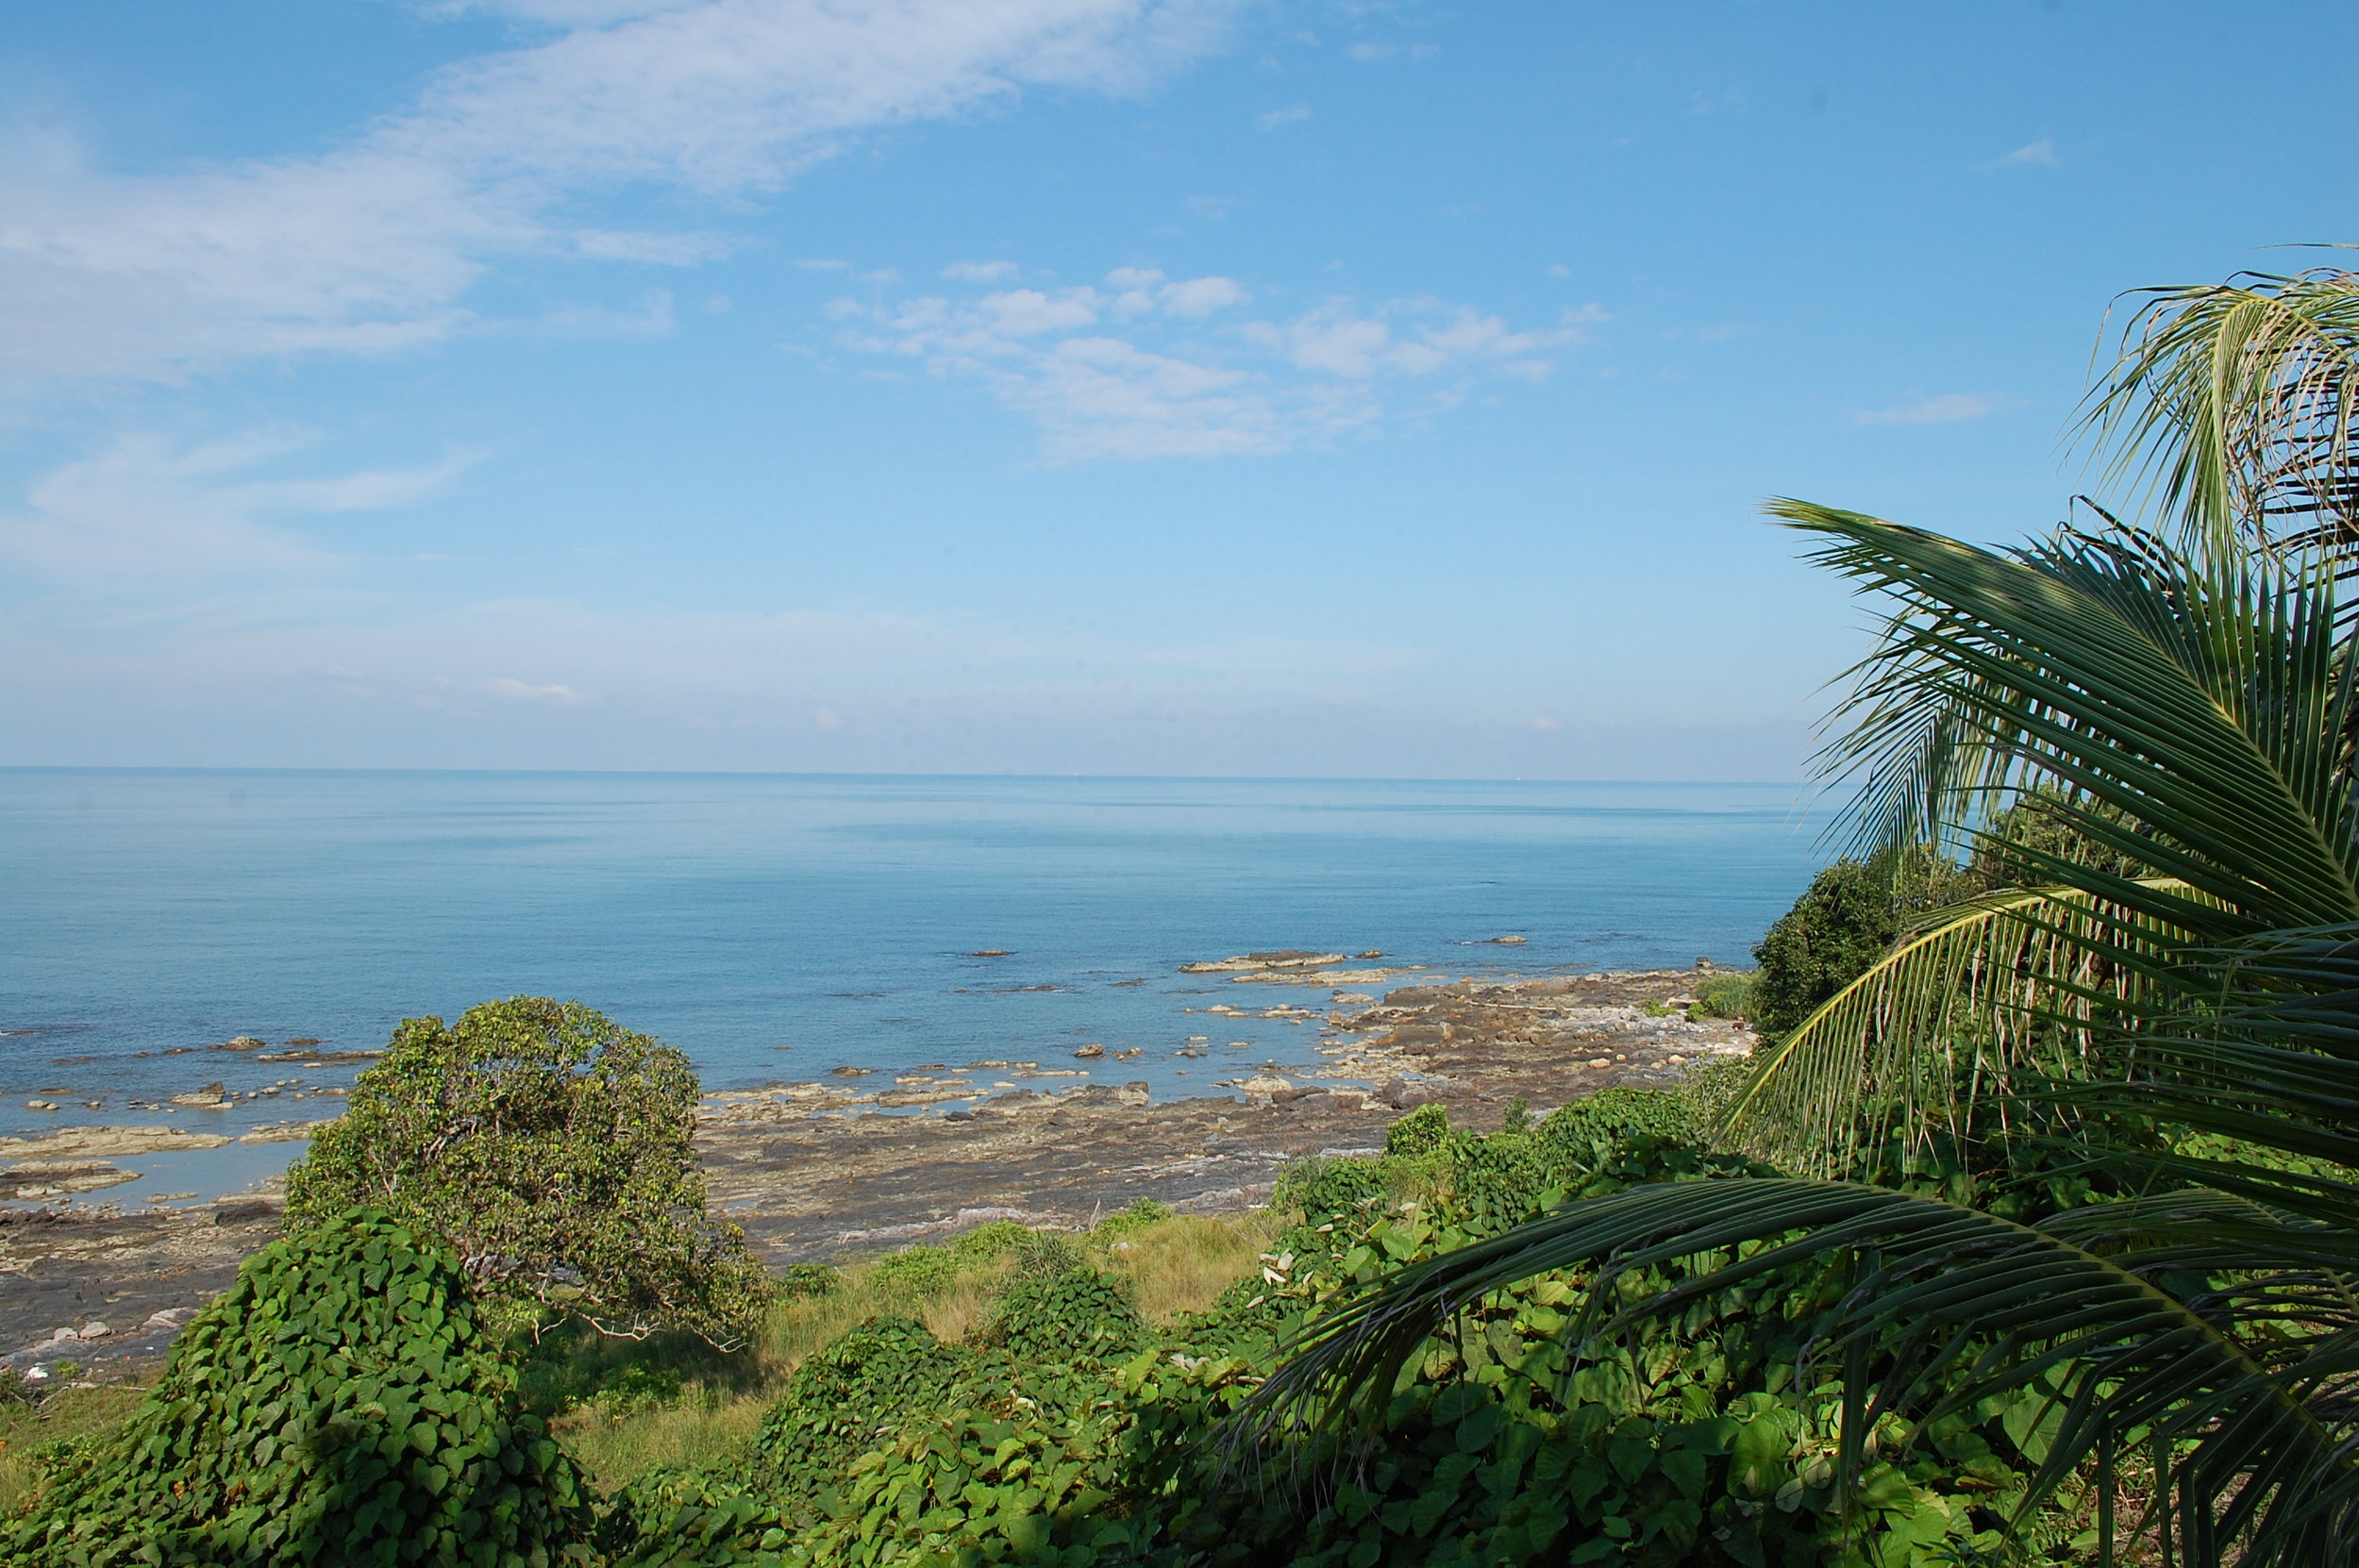 Sedili, Seashore, Coast, Scenic.JPG